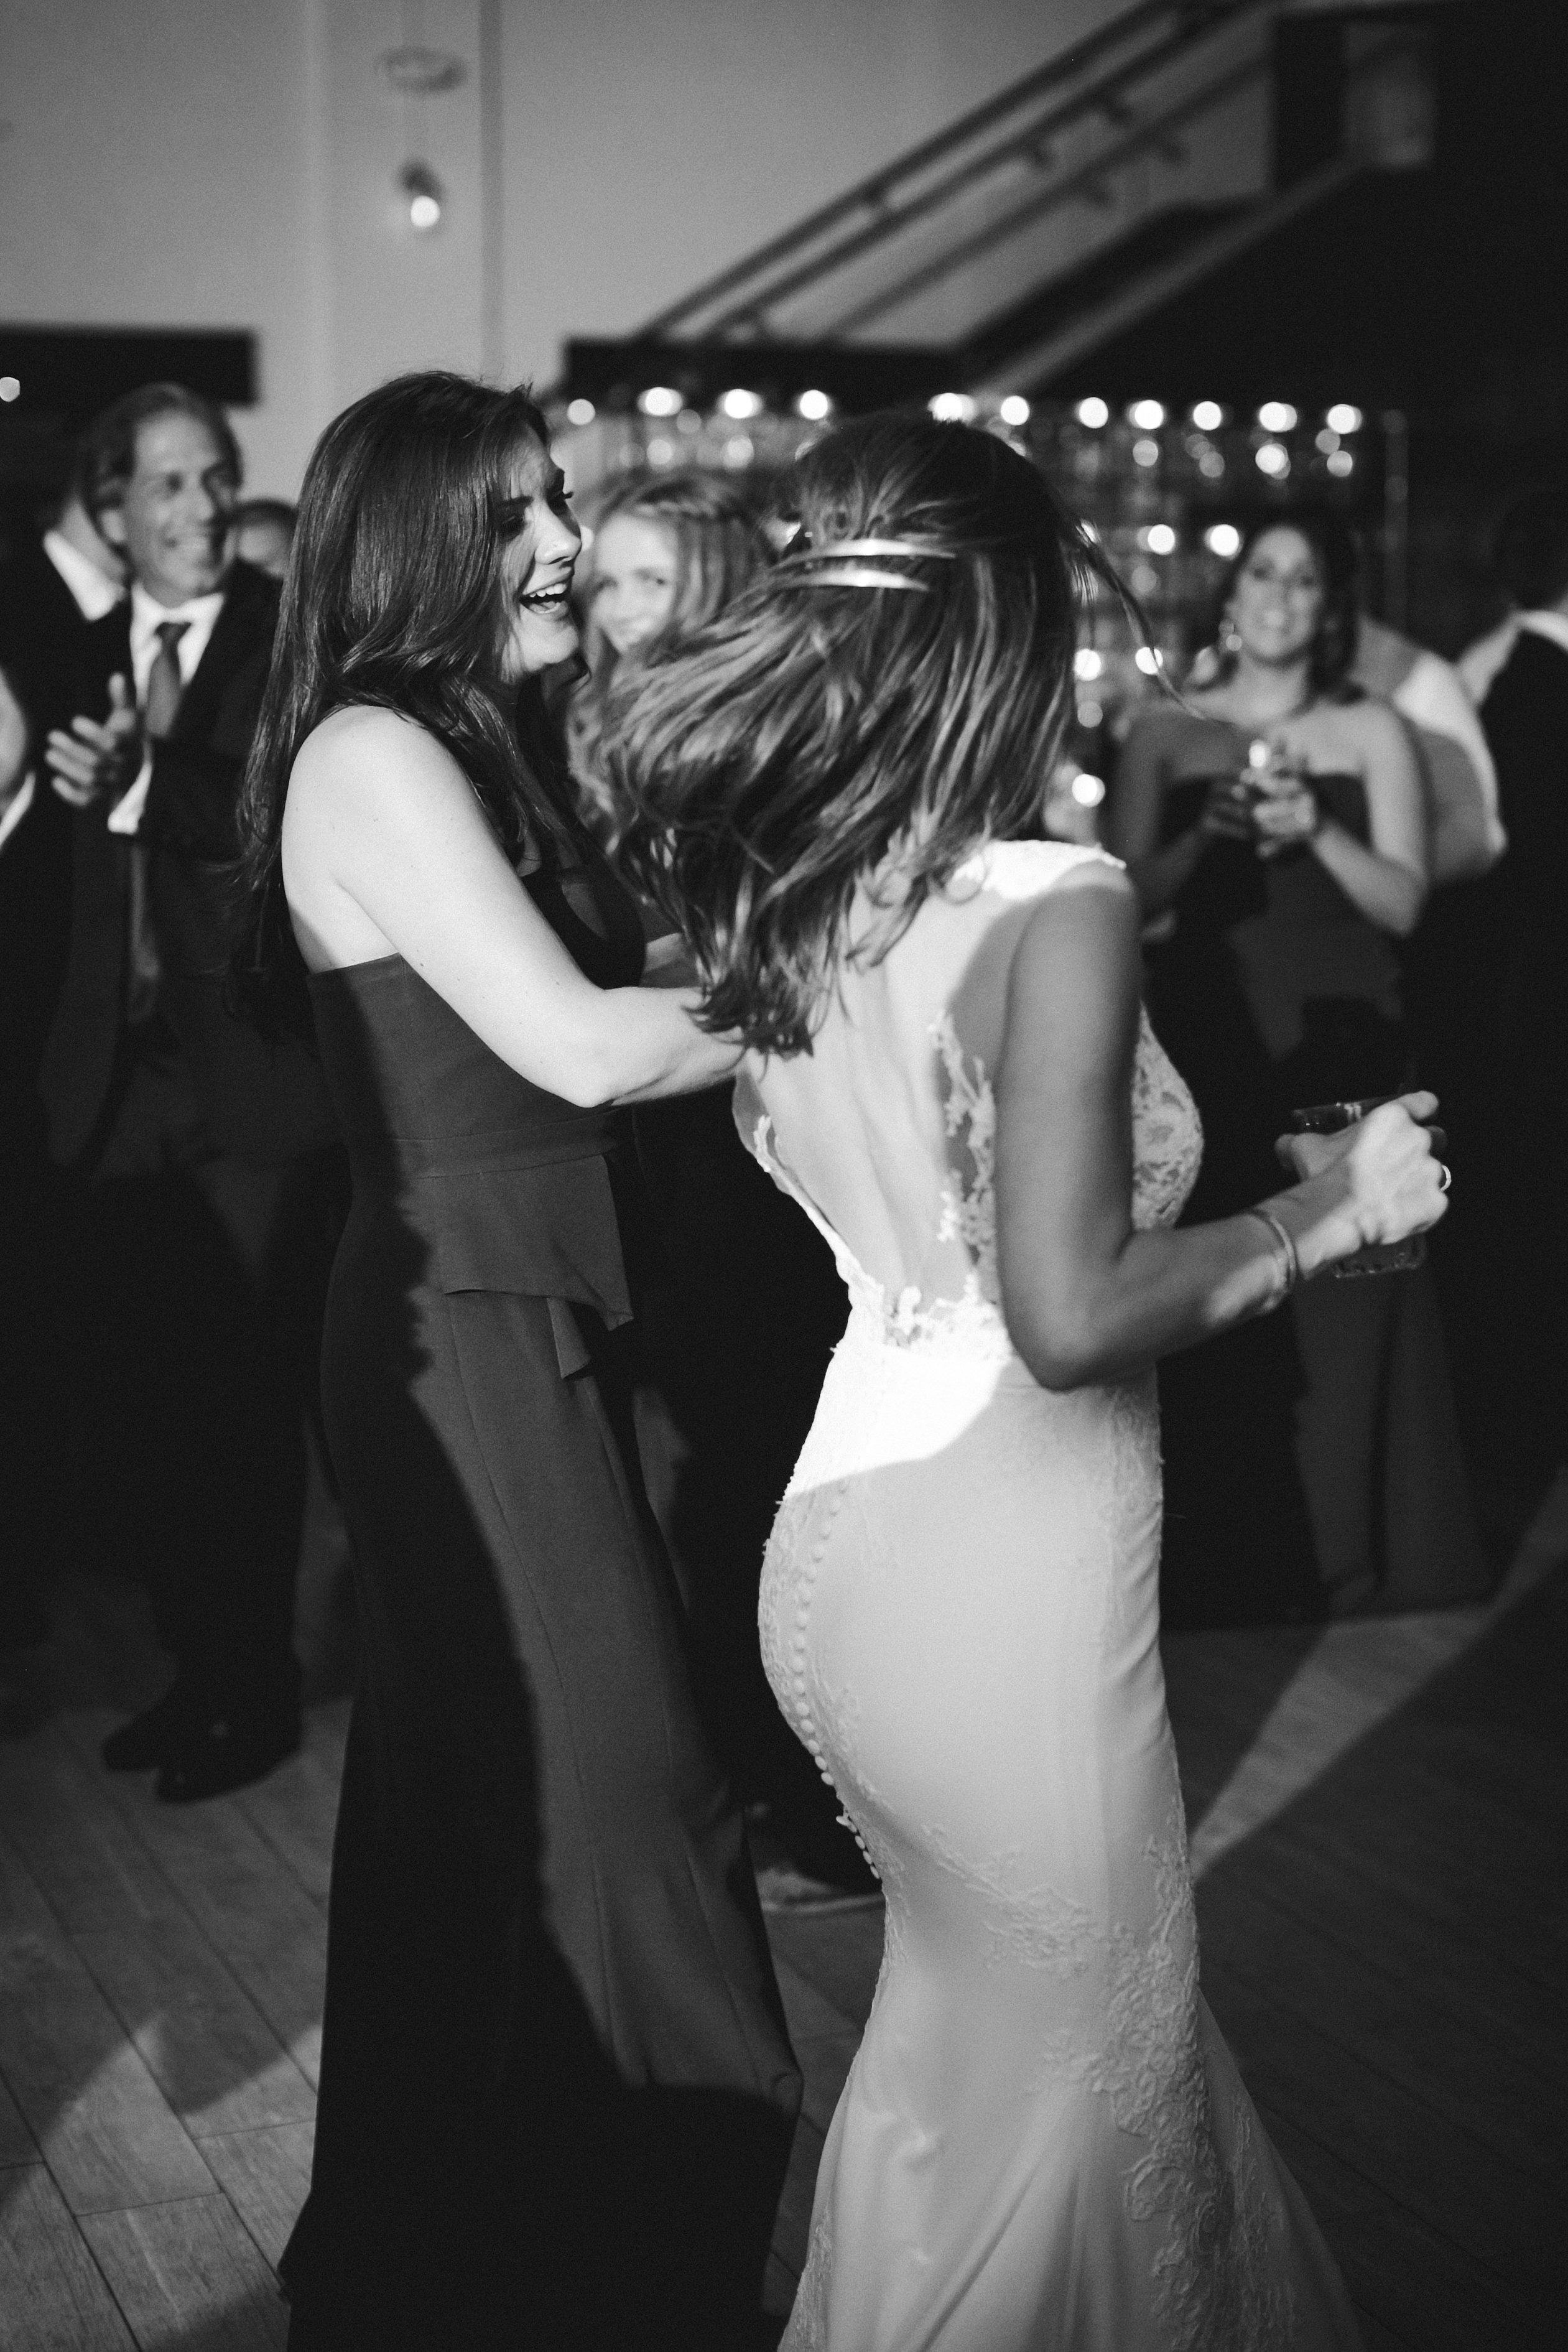 meaghan mark wedding reception dancing